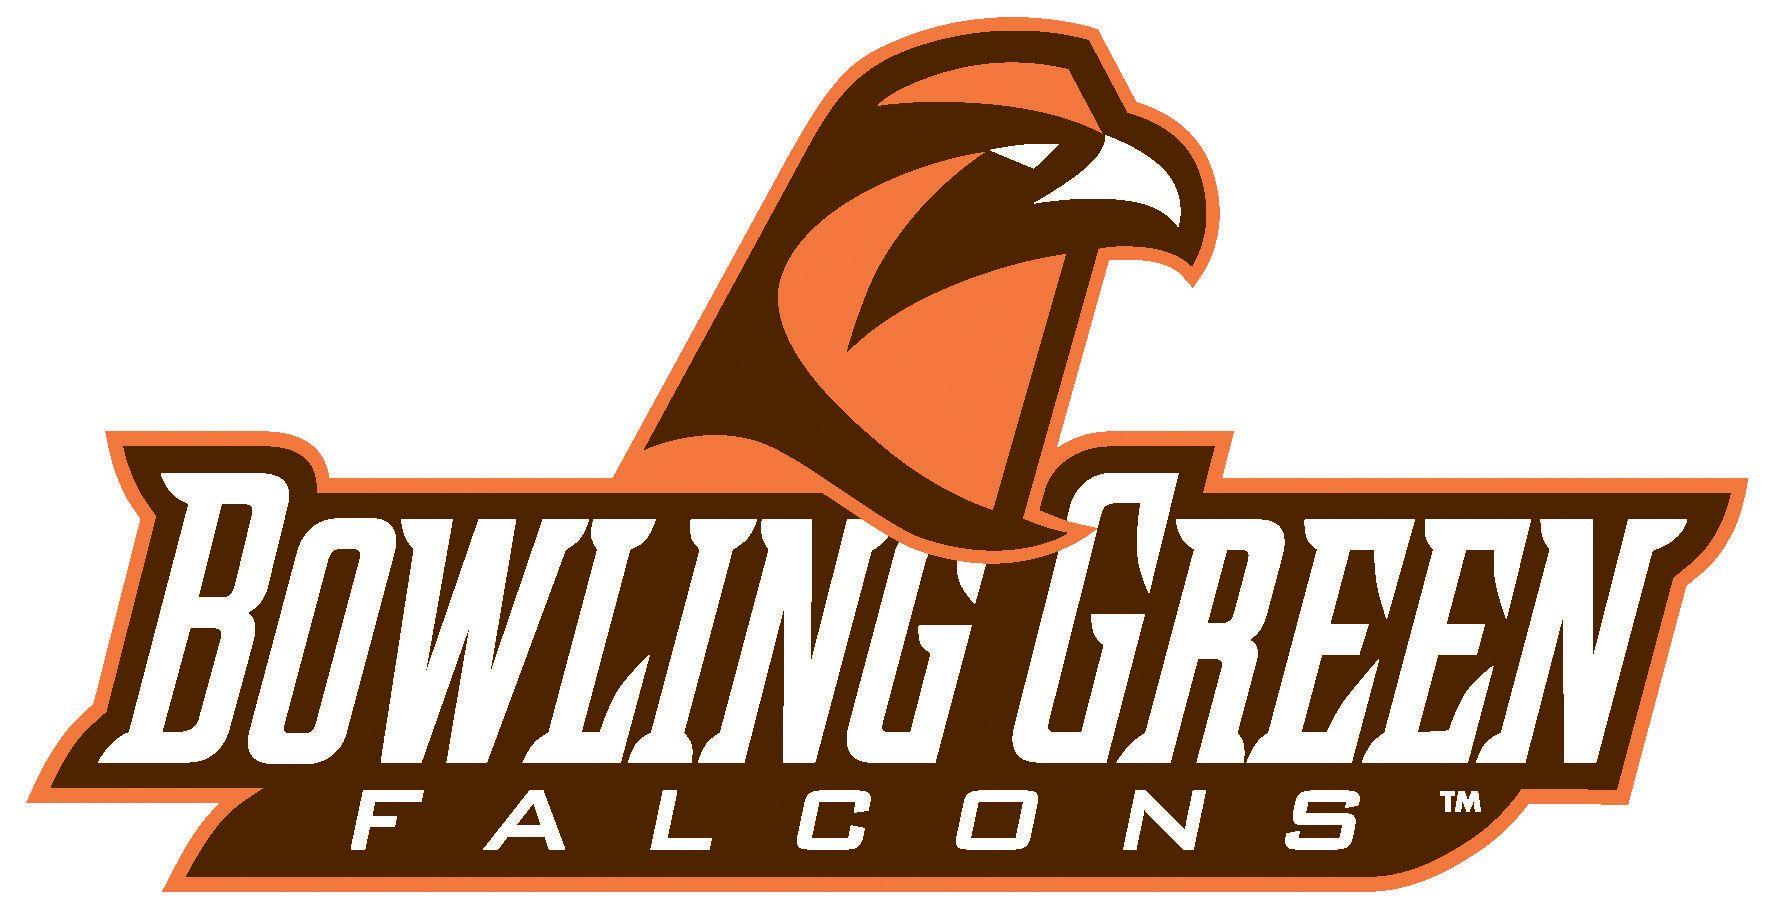 11 Things I Love About BGSU. Bowling, Hockey logos, Falcons